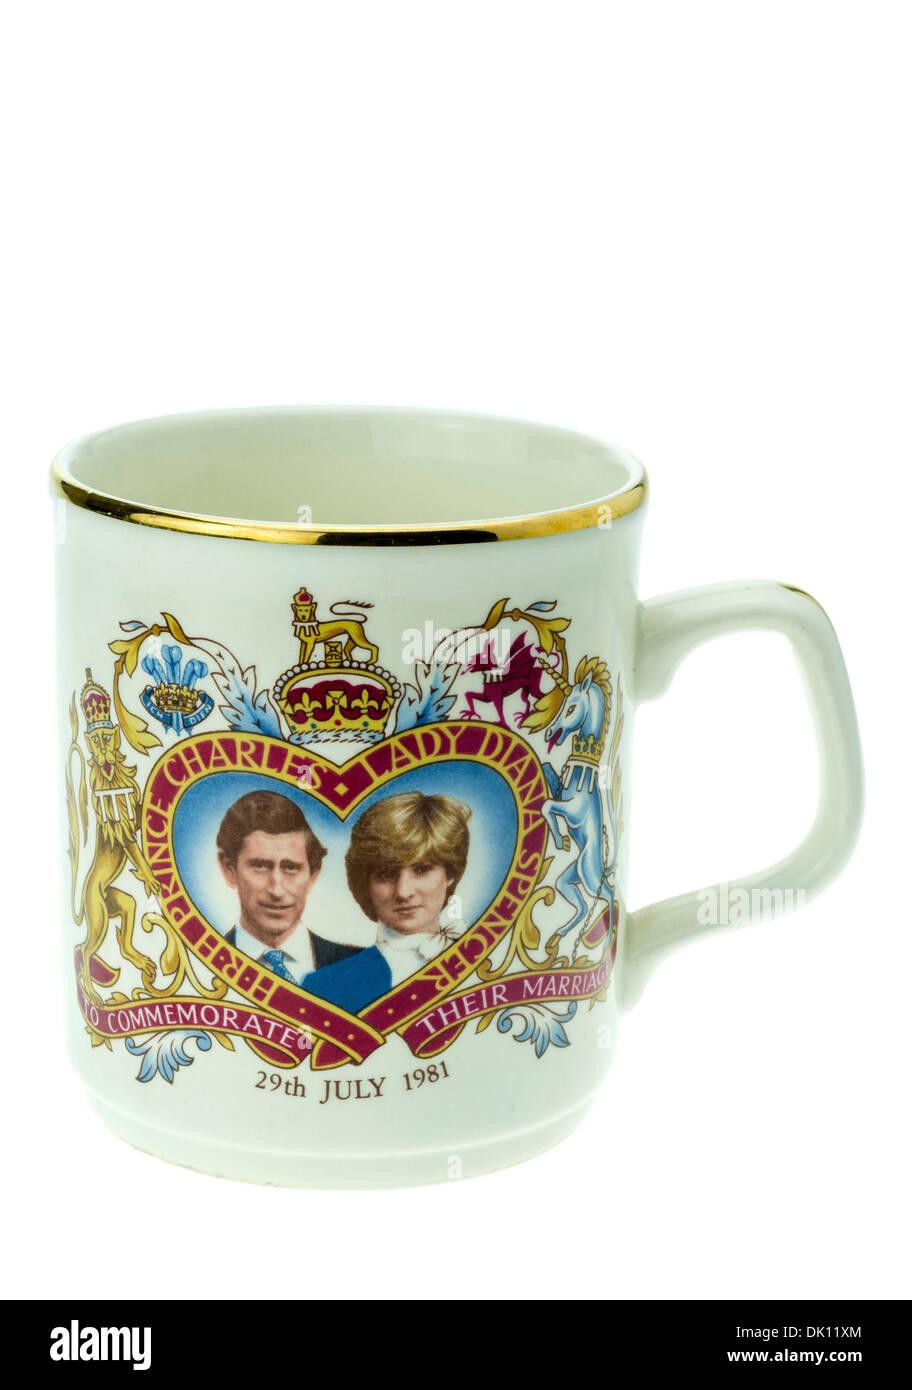 Prince Charles and Lady Diana Spencer Commemorative Royal Wedding Day Mug. Stock Photo